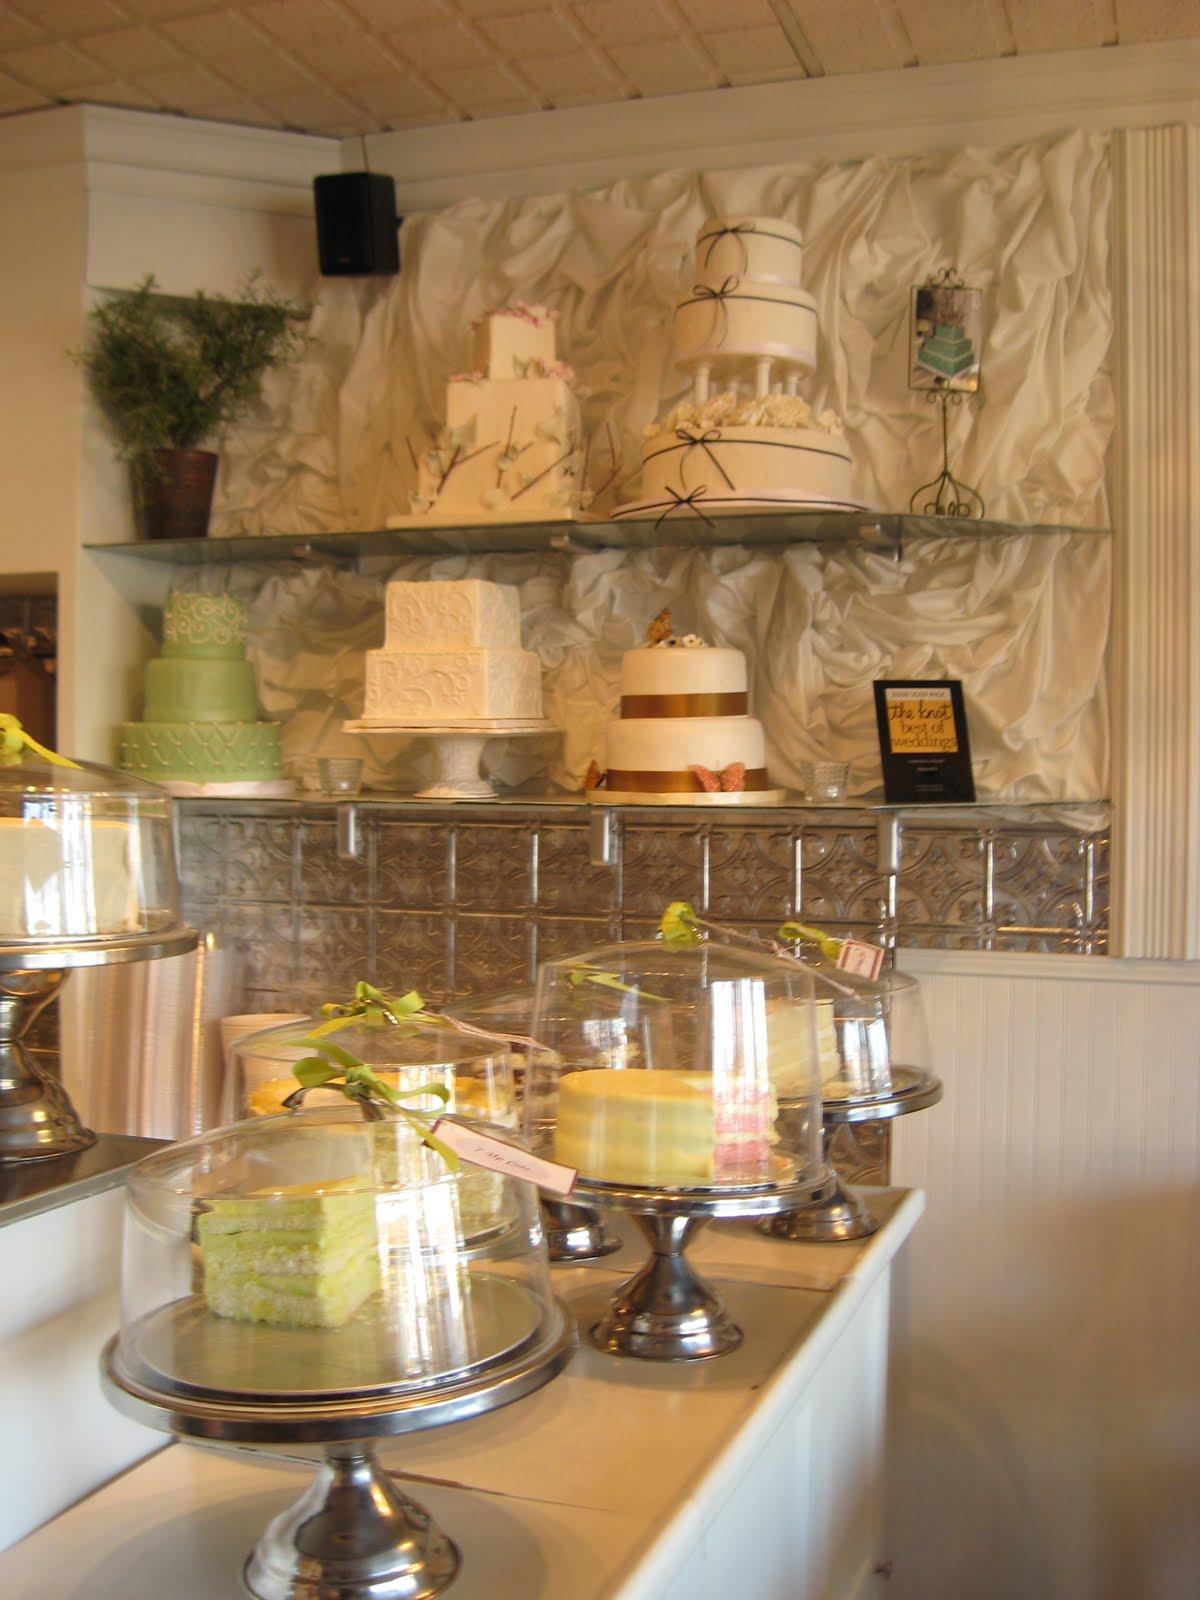 Cake Decorating Stores In Greensboro Nc : Cupcake Courtesans: Greensboro s Maxie B s